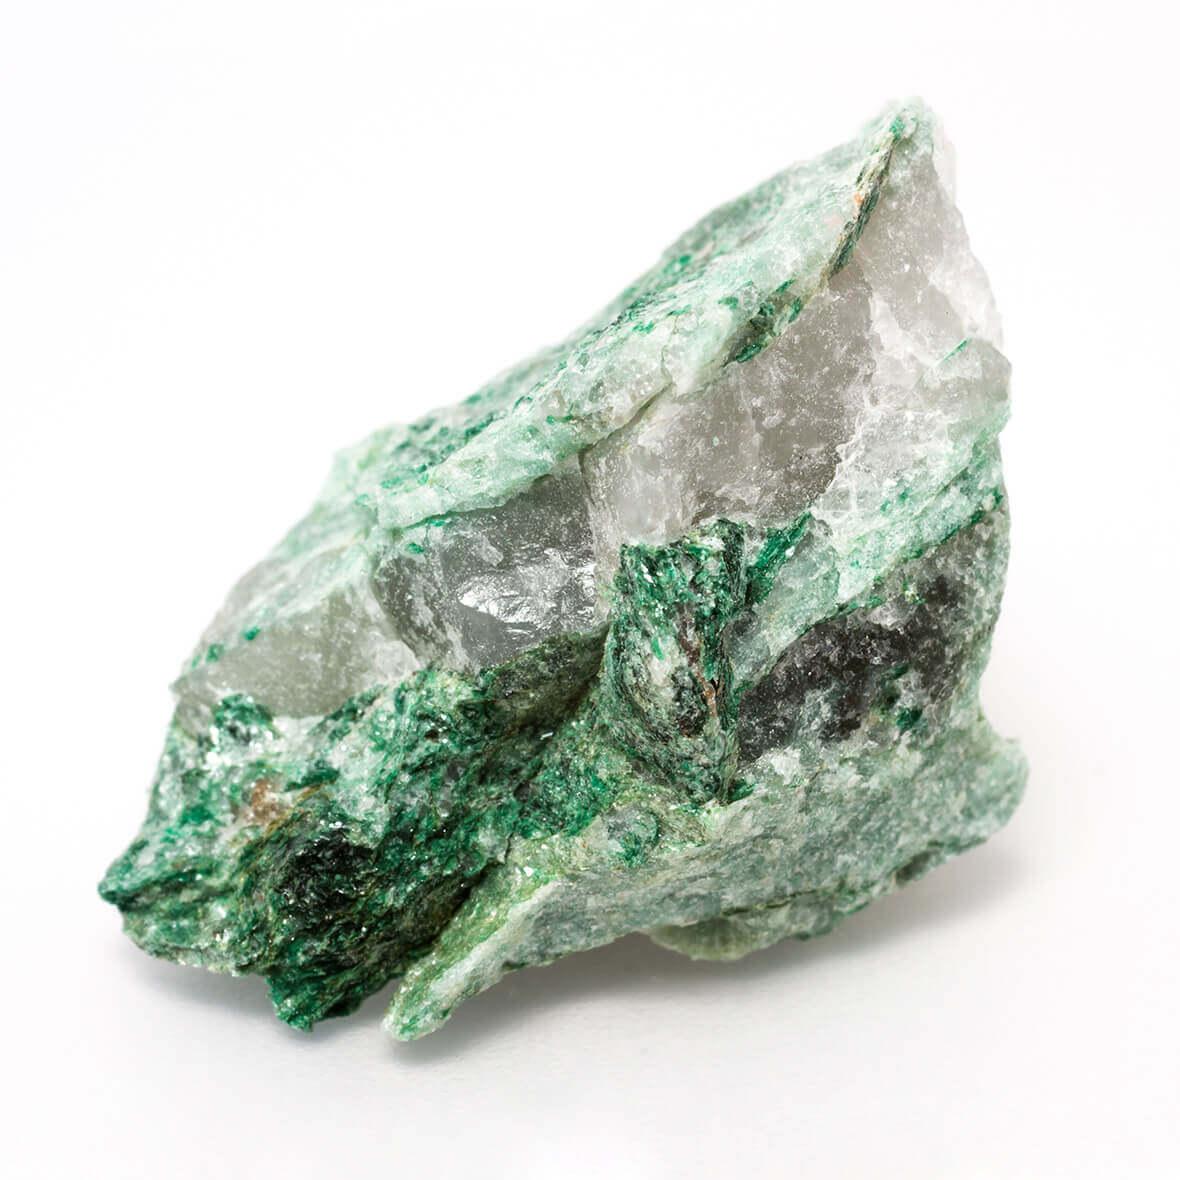 glimmermineralien